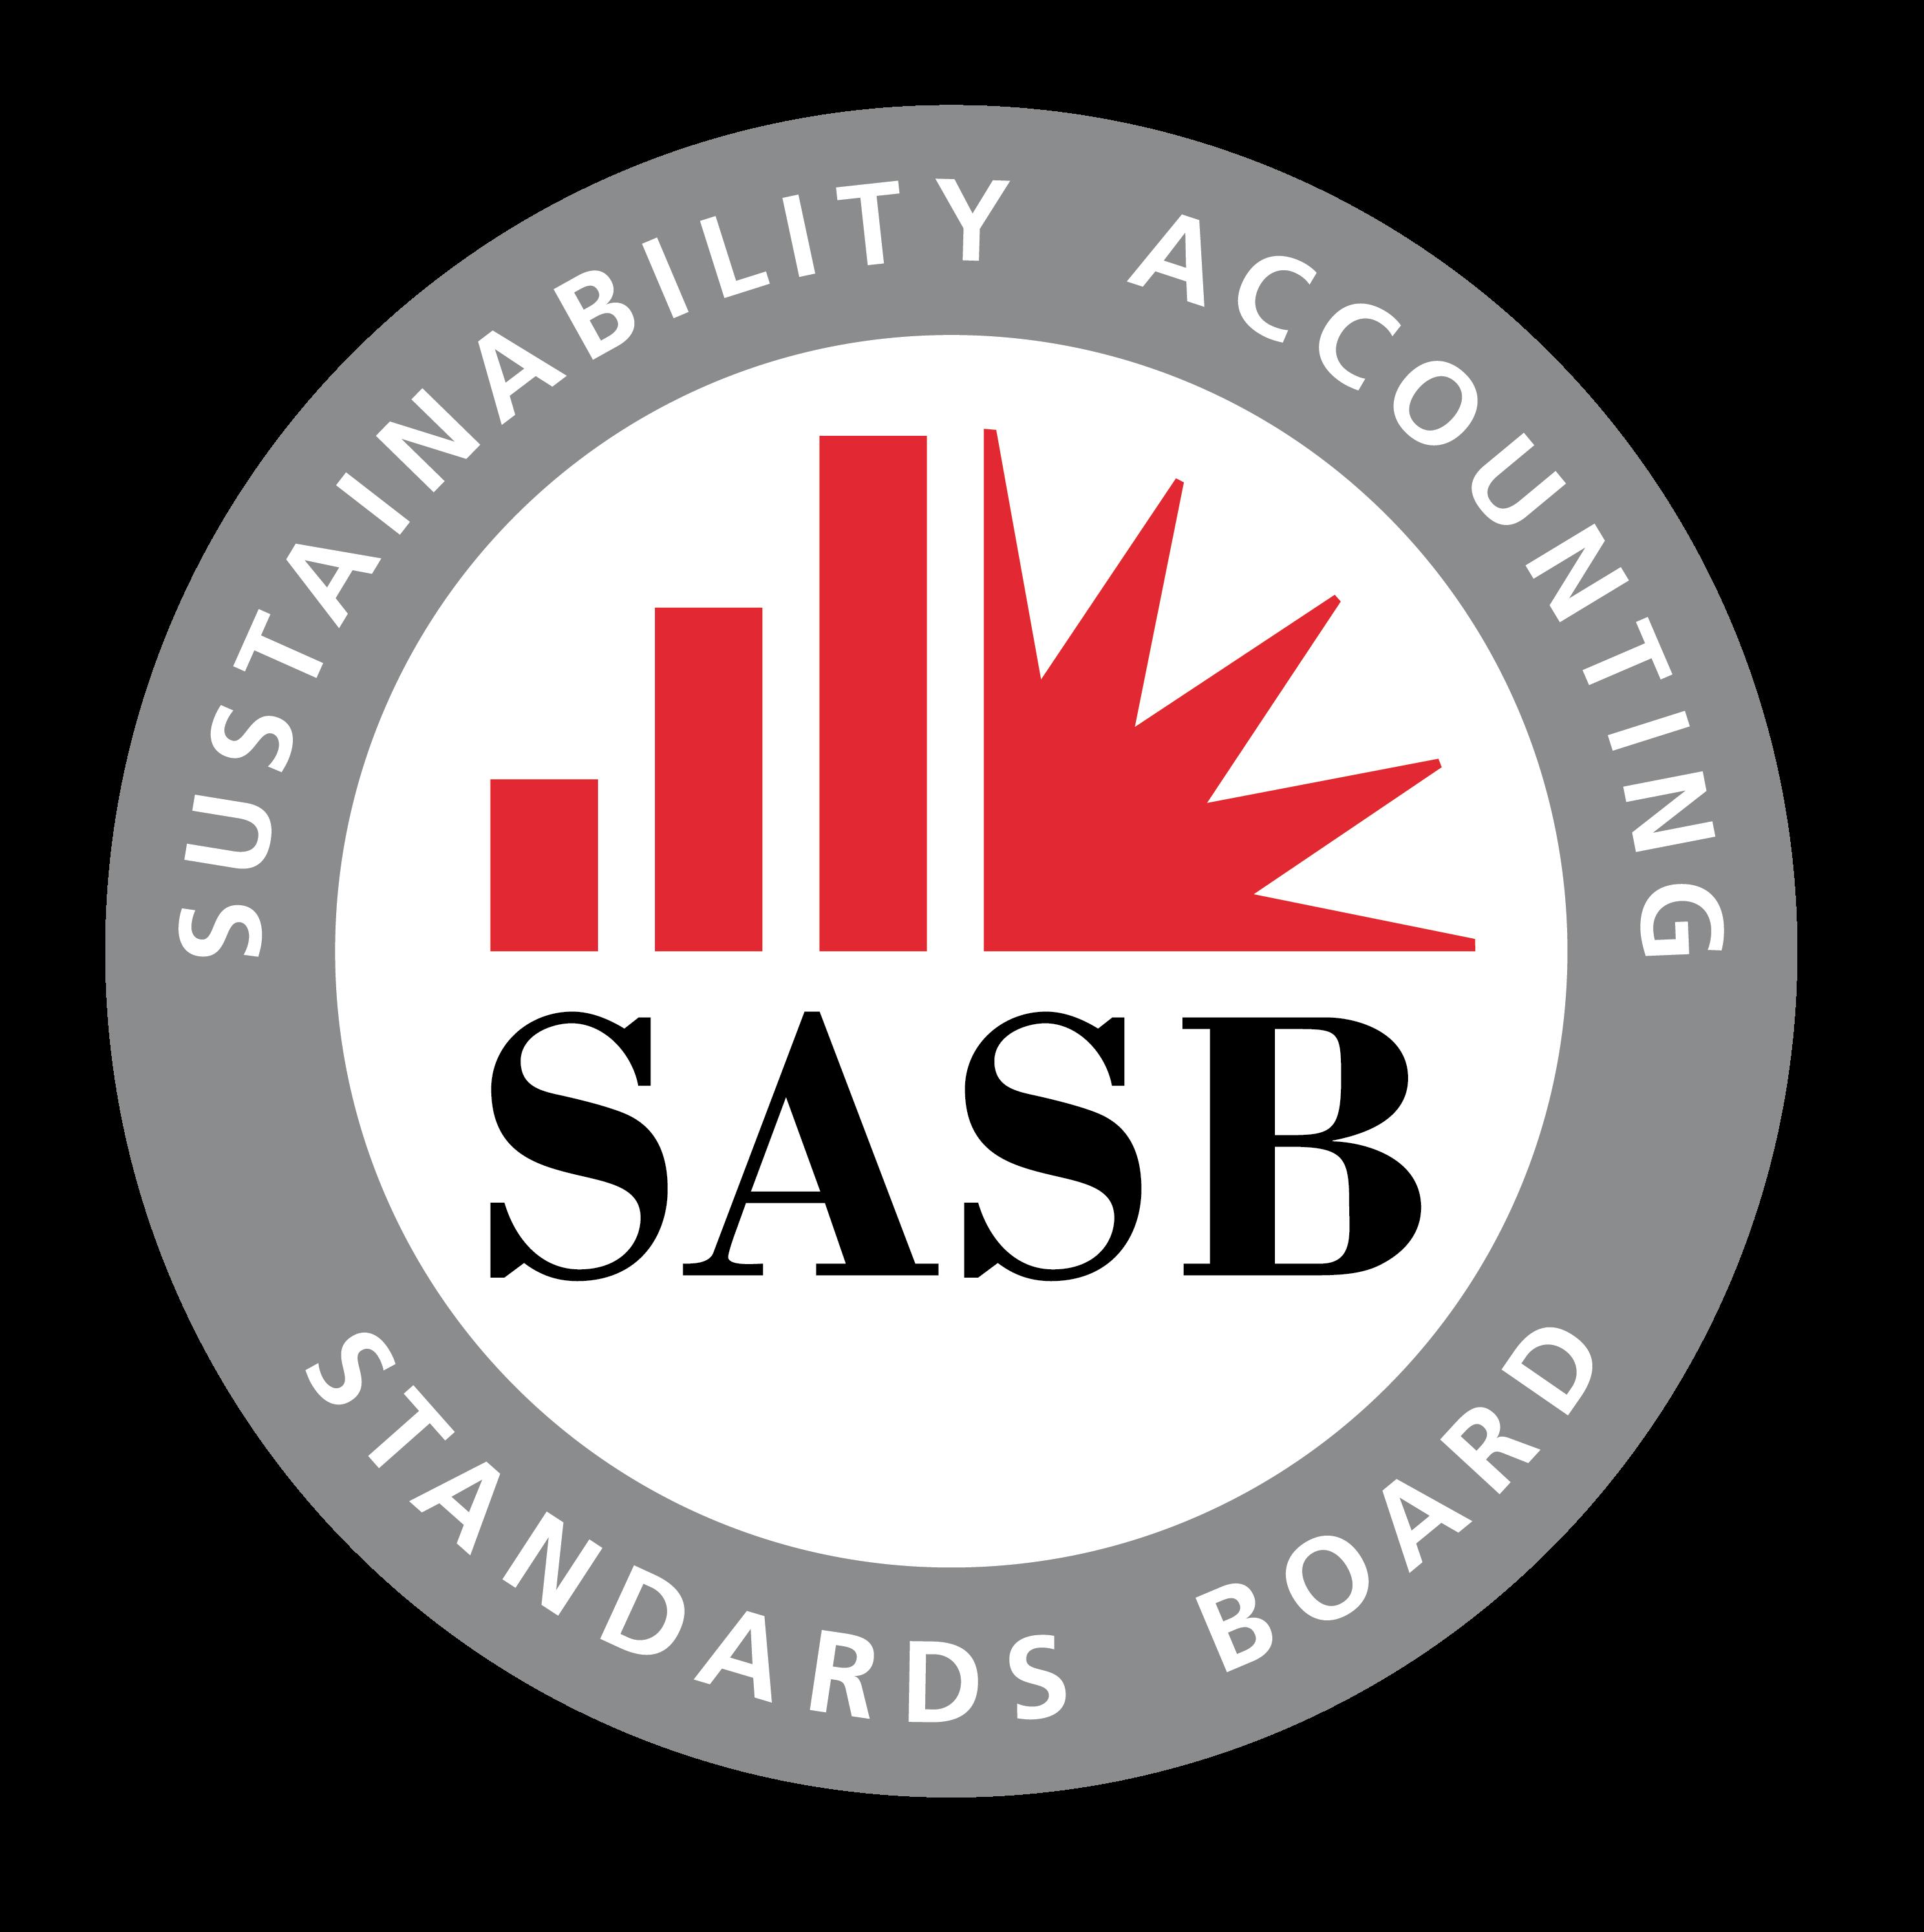 Sustainability Accounting Standards Board (SASB) Foundation